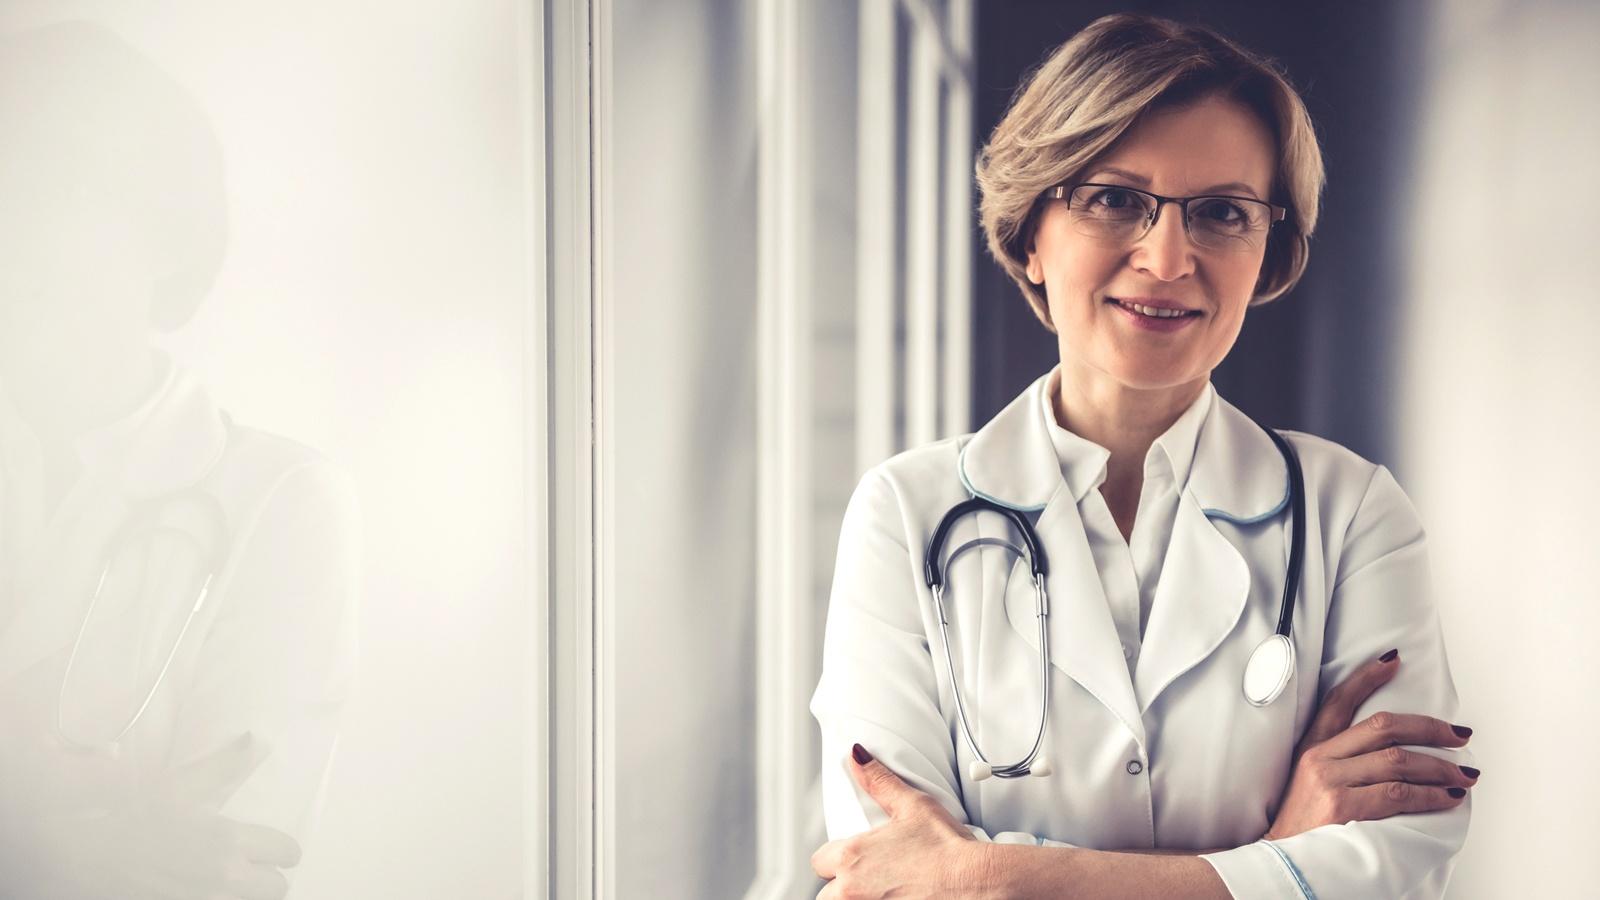 Physician Assistant, OB/GYN